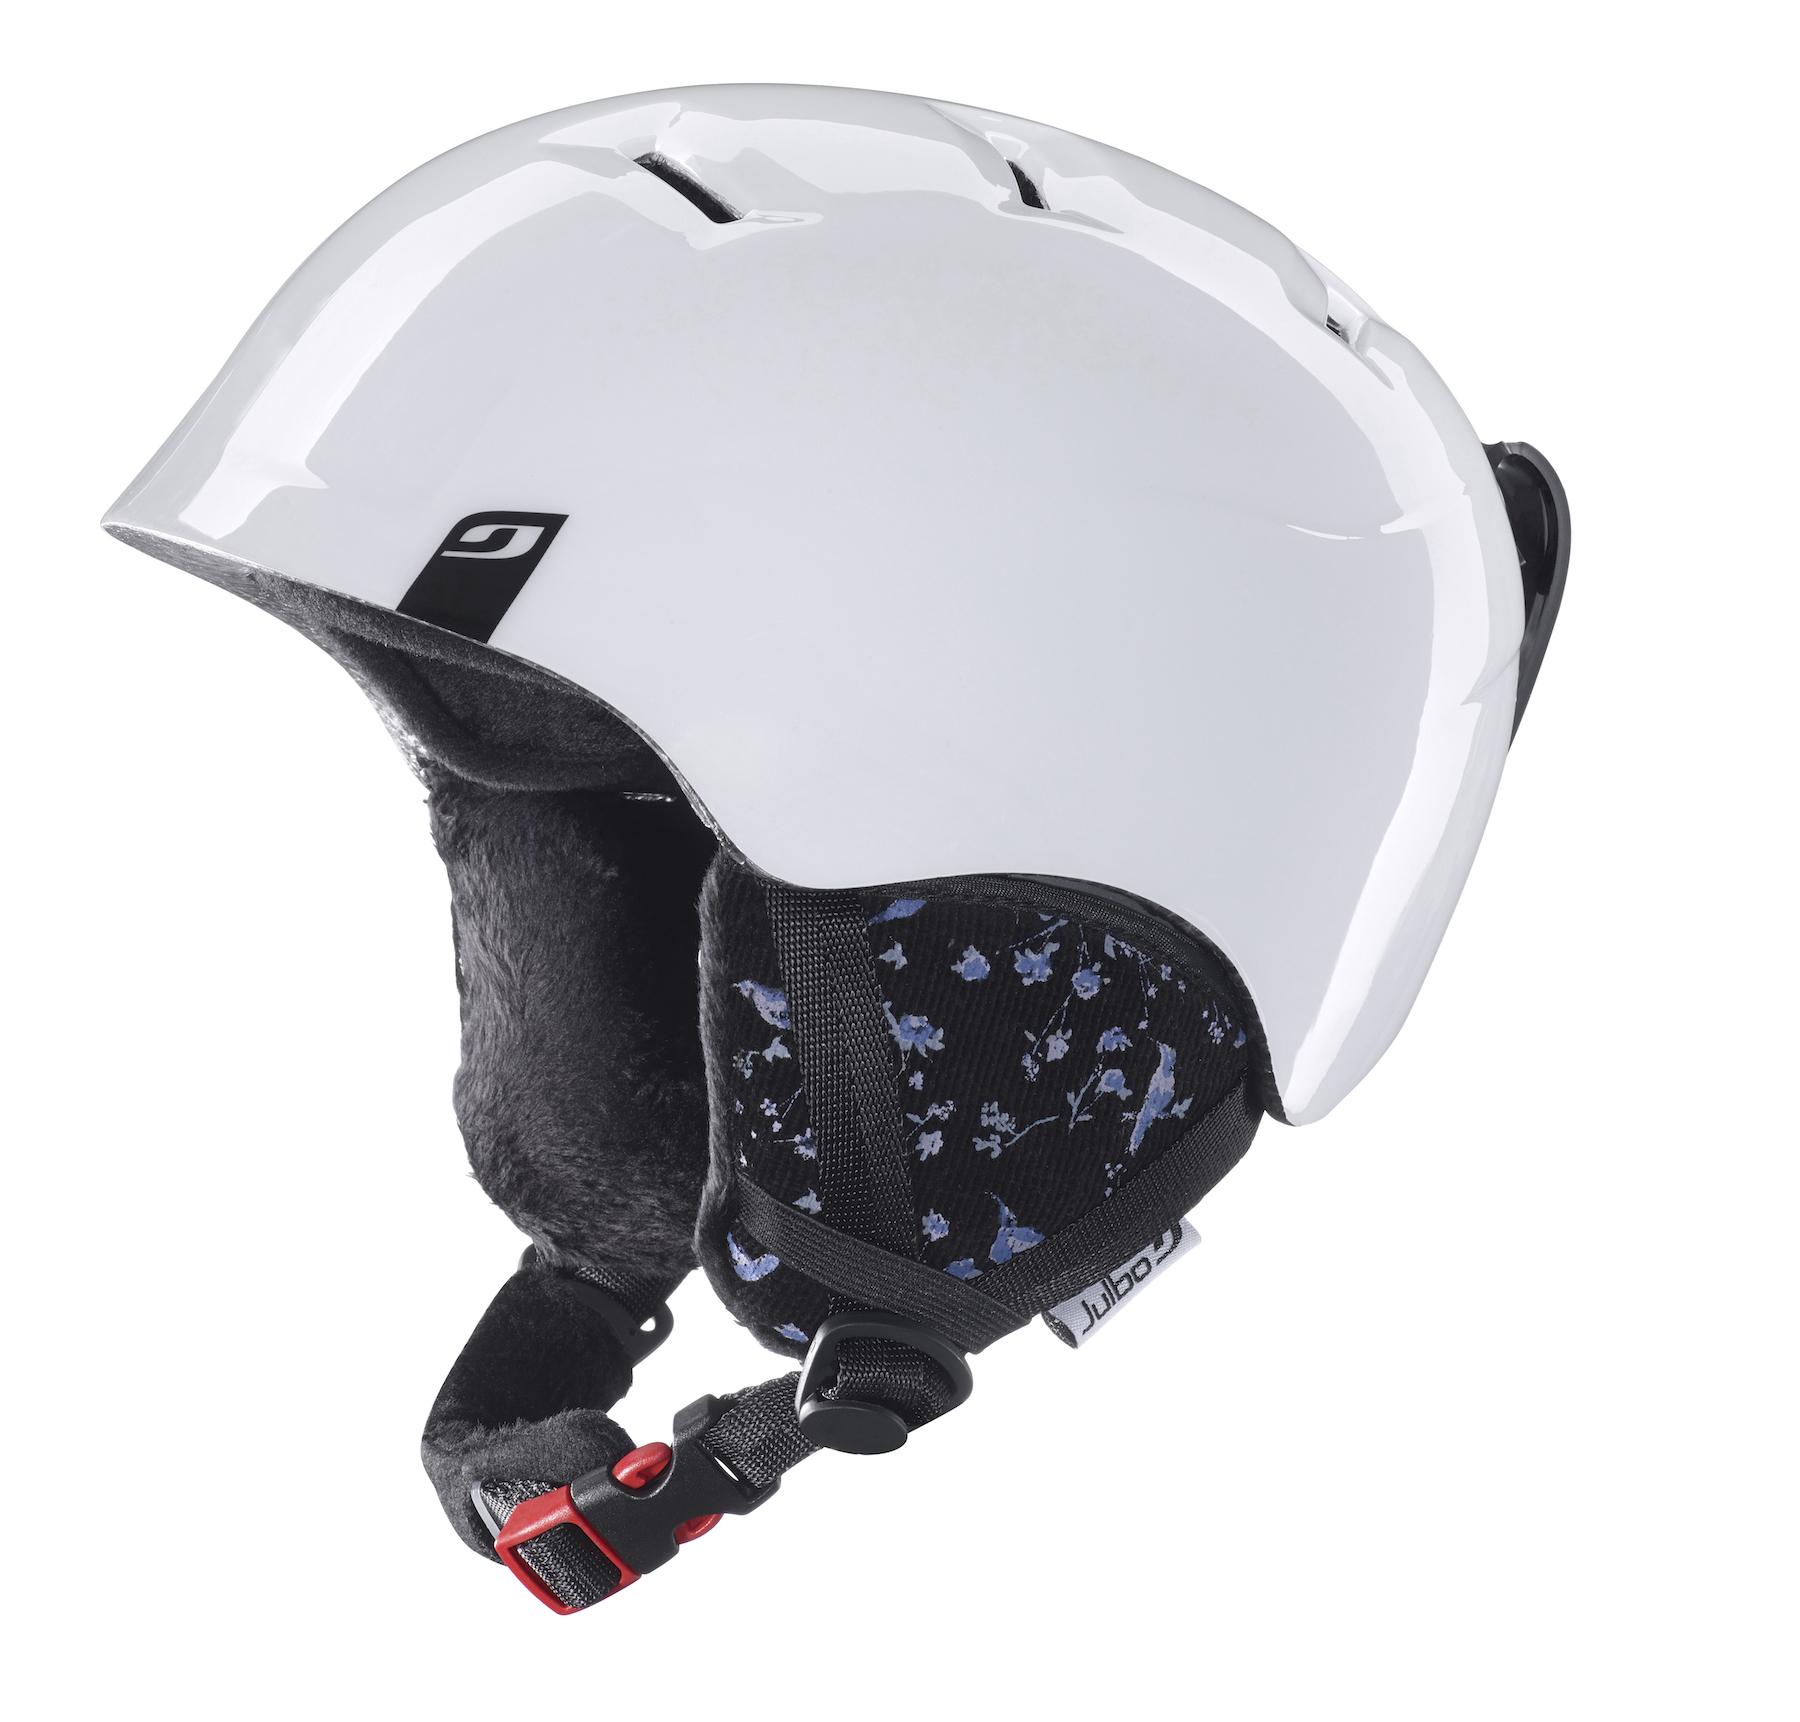 Julbo - Twist - Ski helmet - Kids